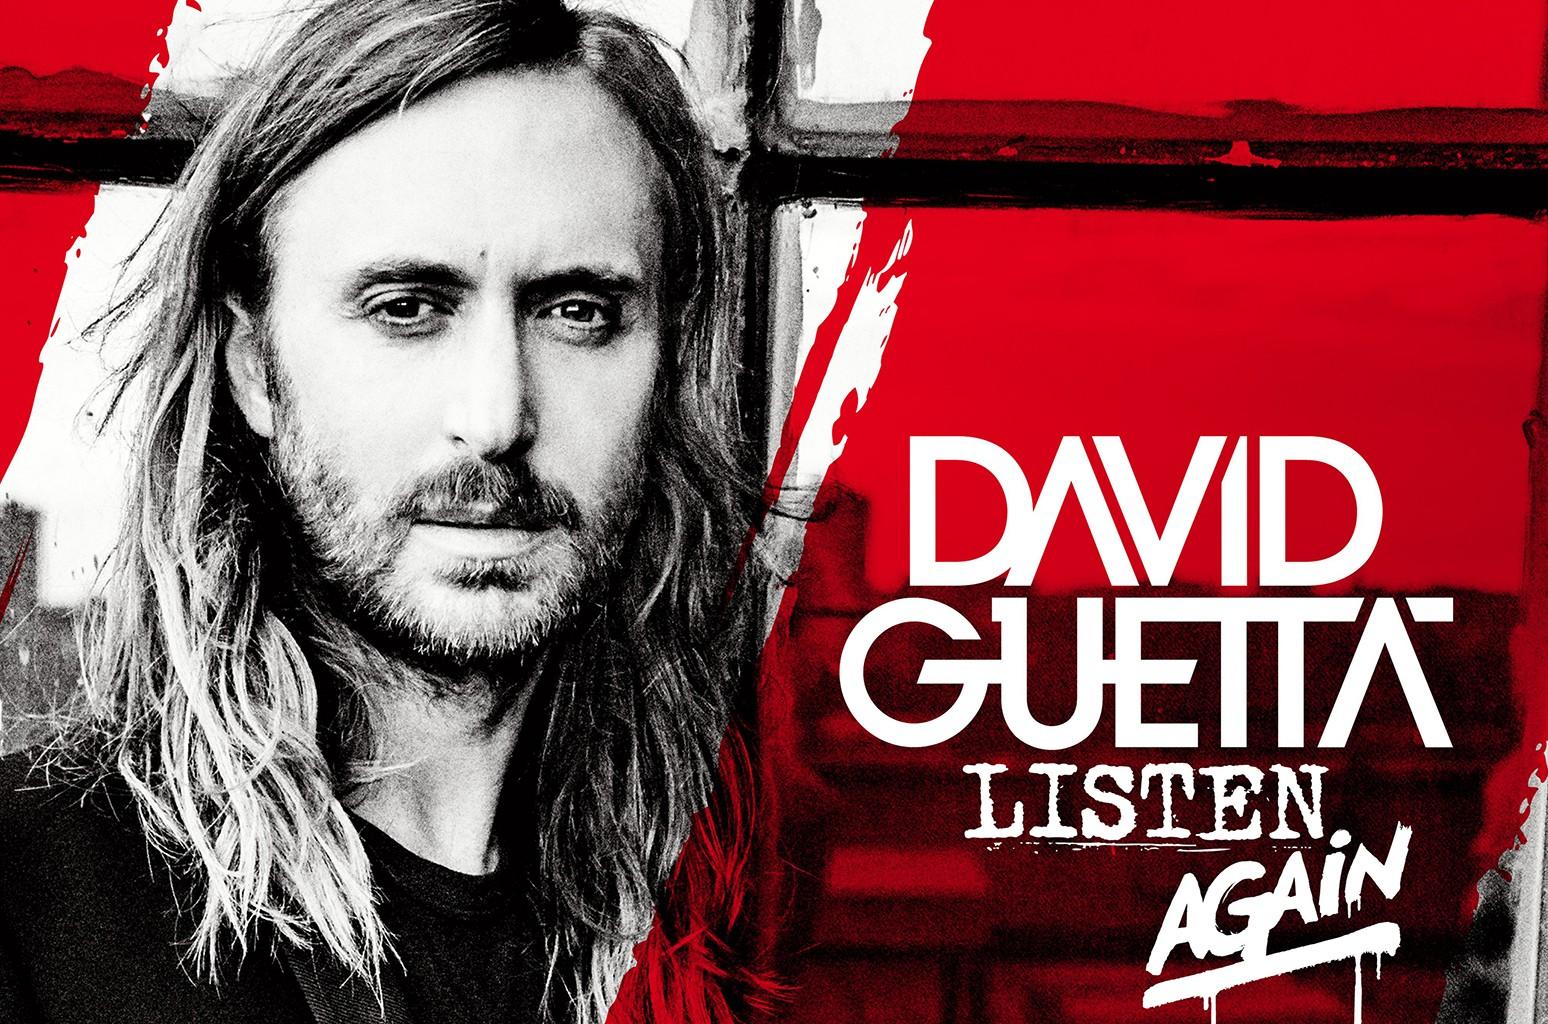 David Guetta's 2016 album Listen Again